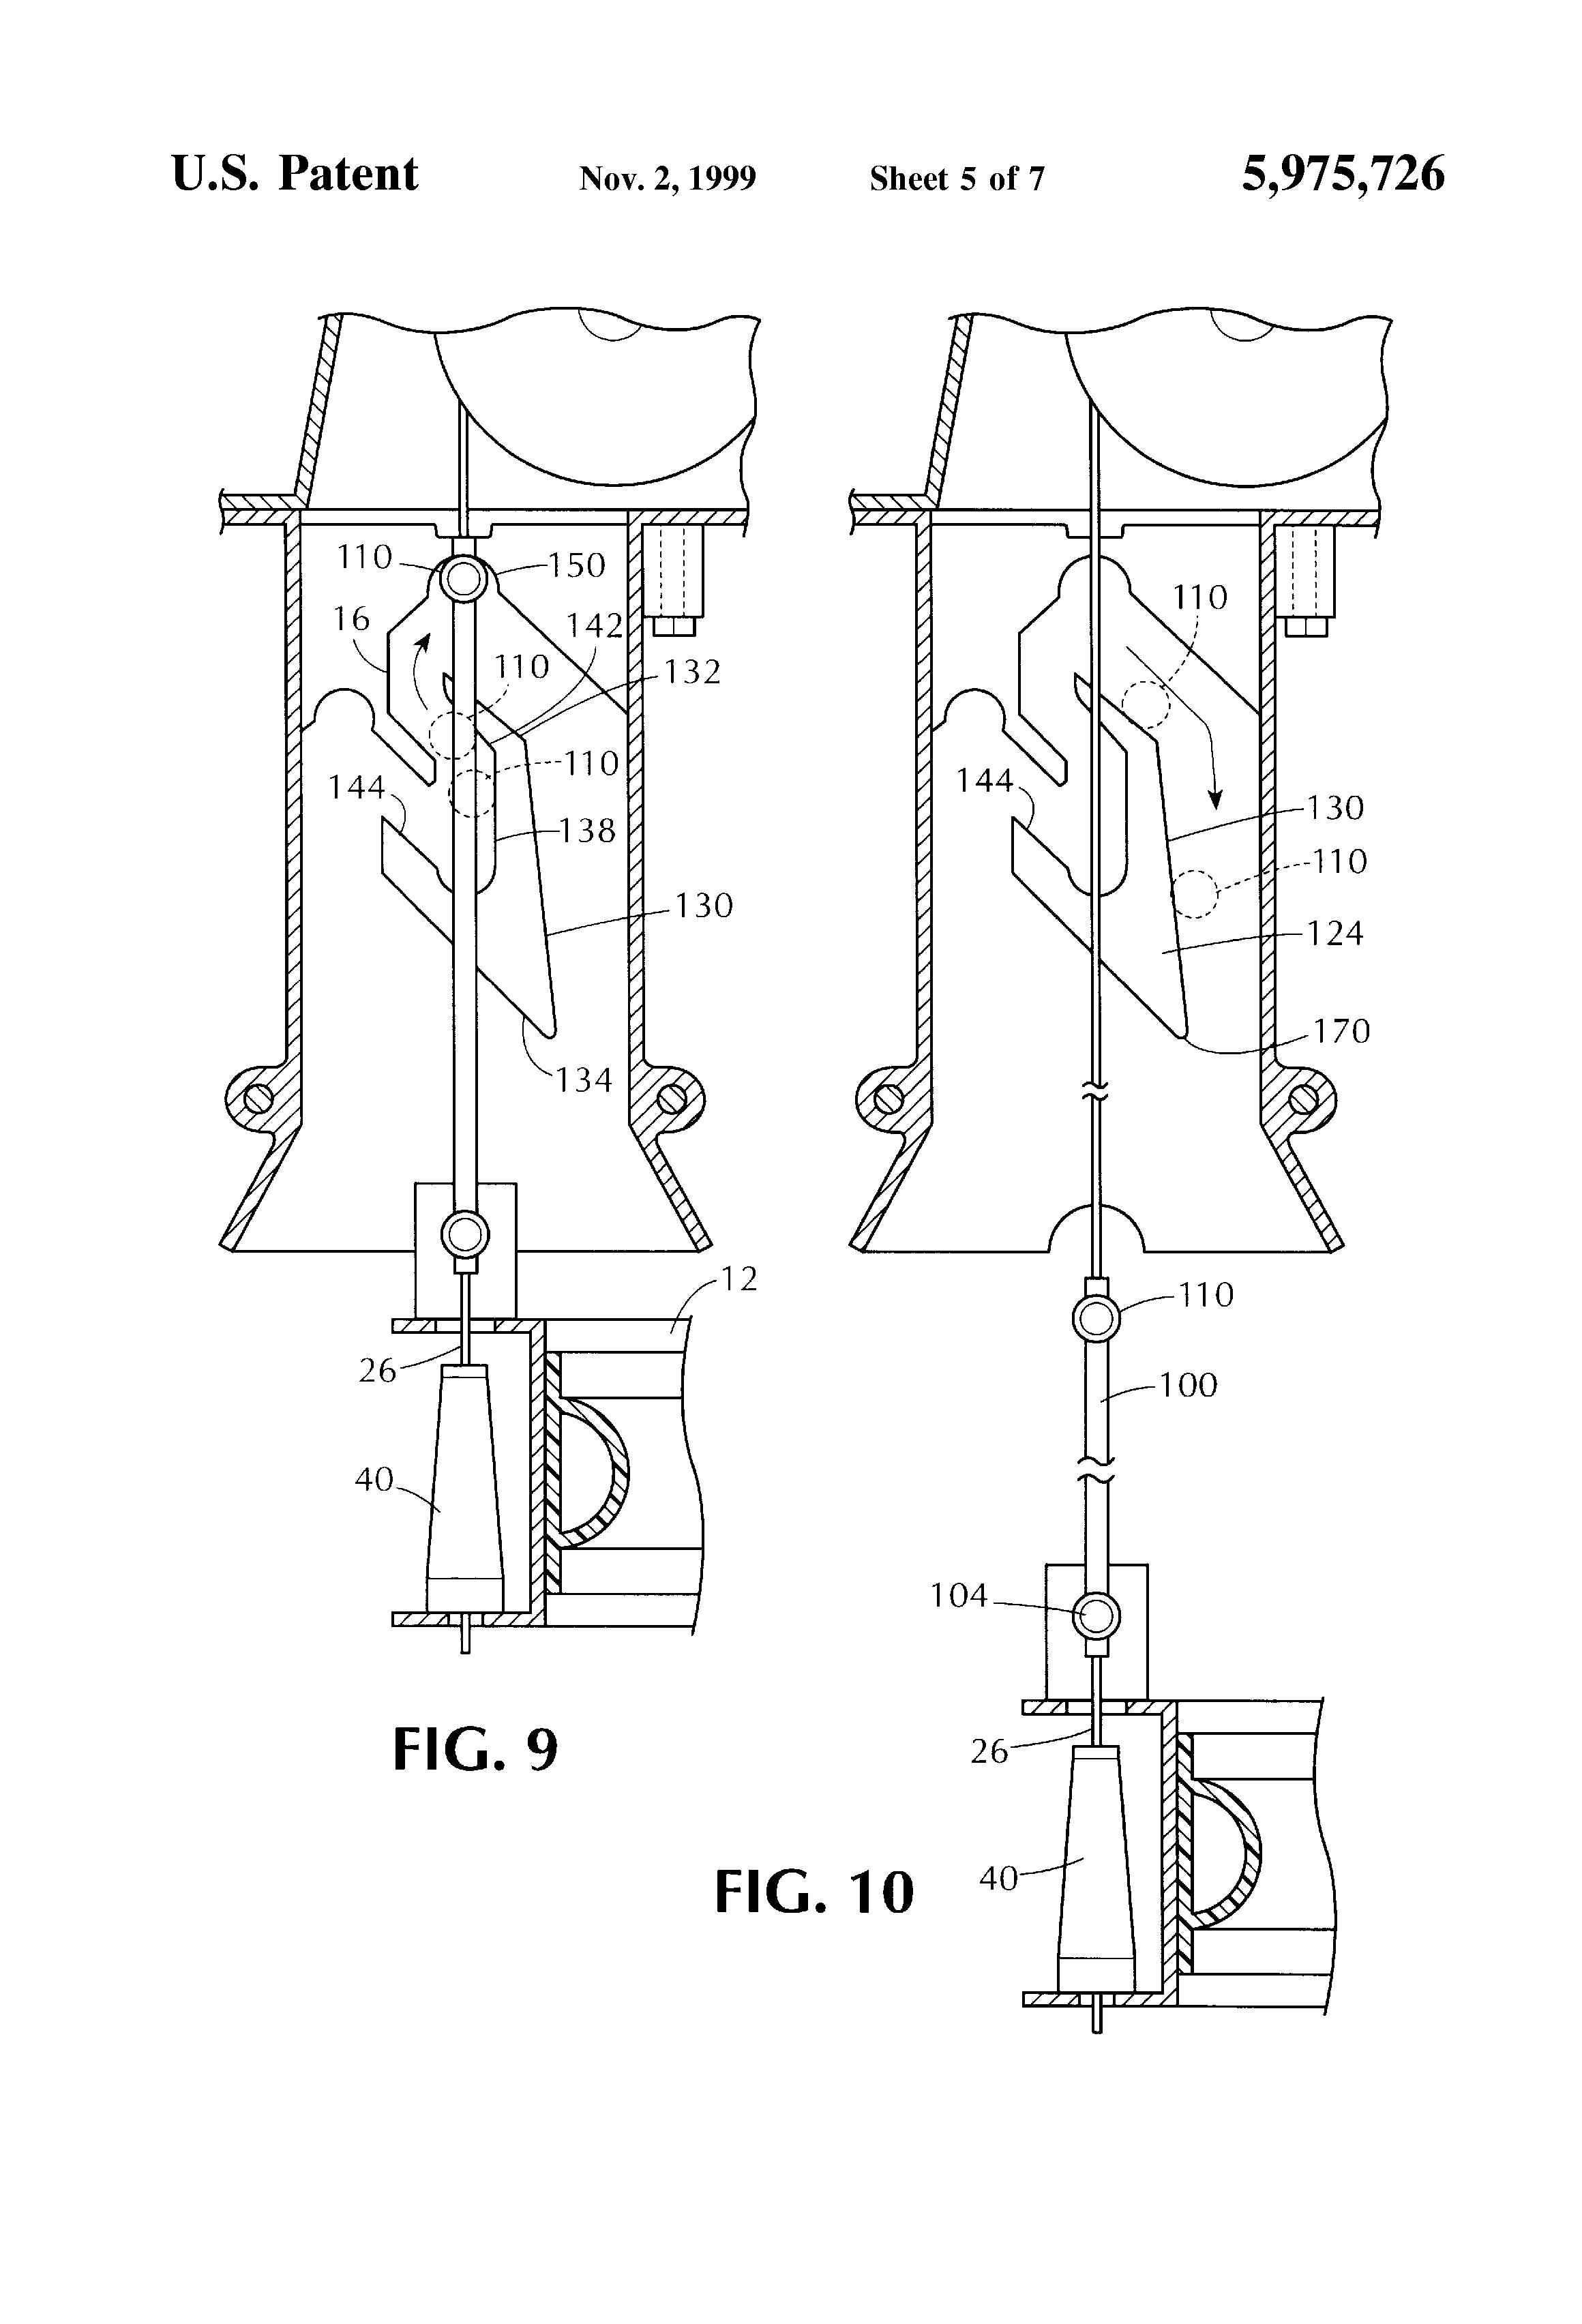 Patent Us5975726 - High Mast Lighting System